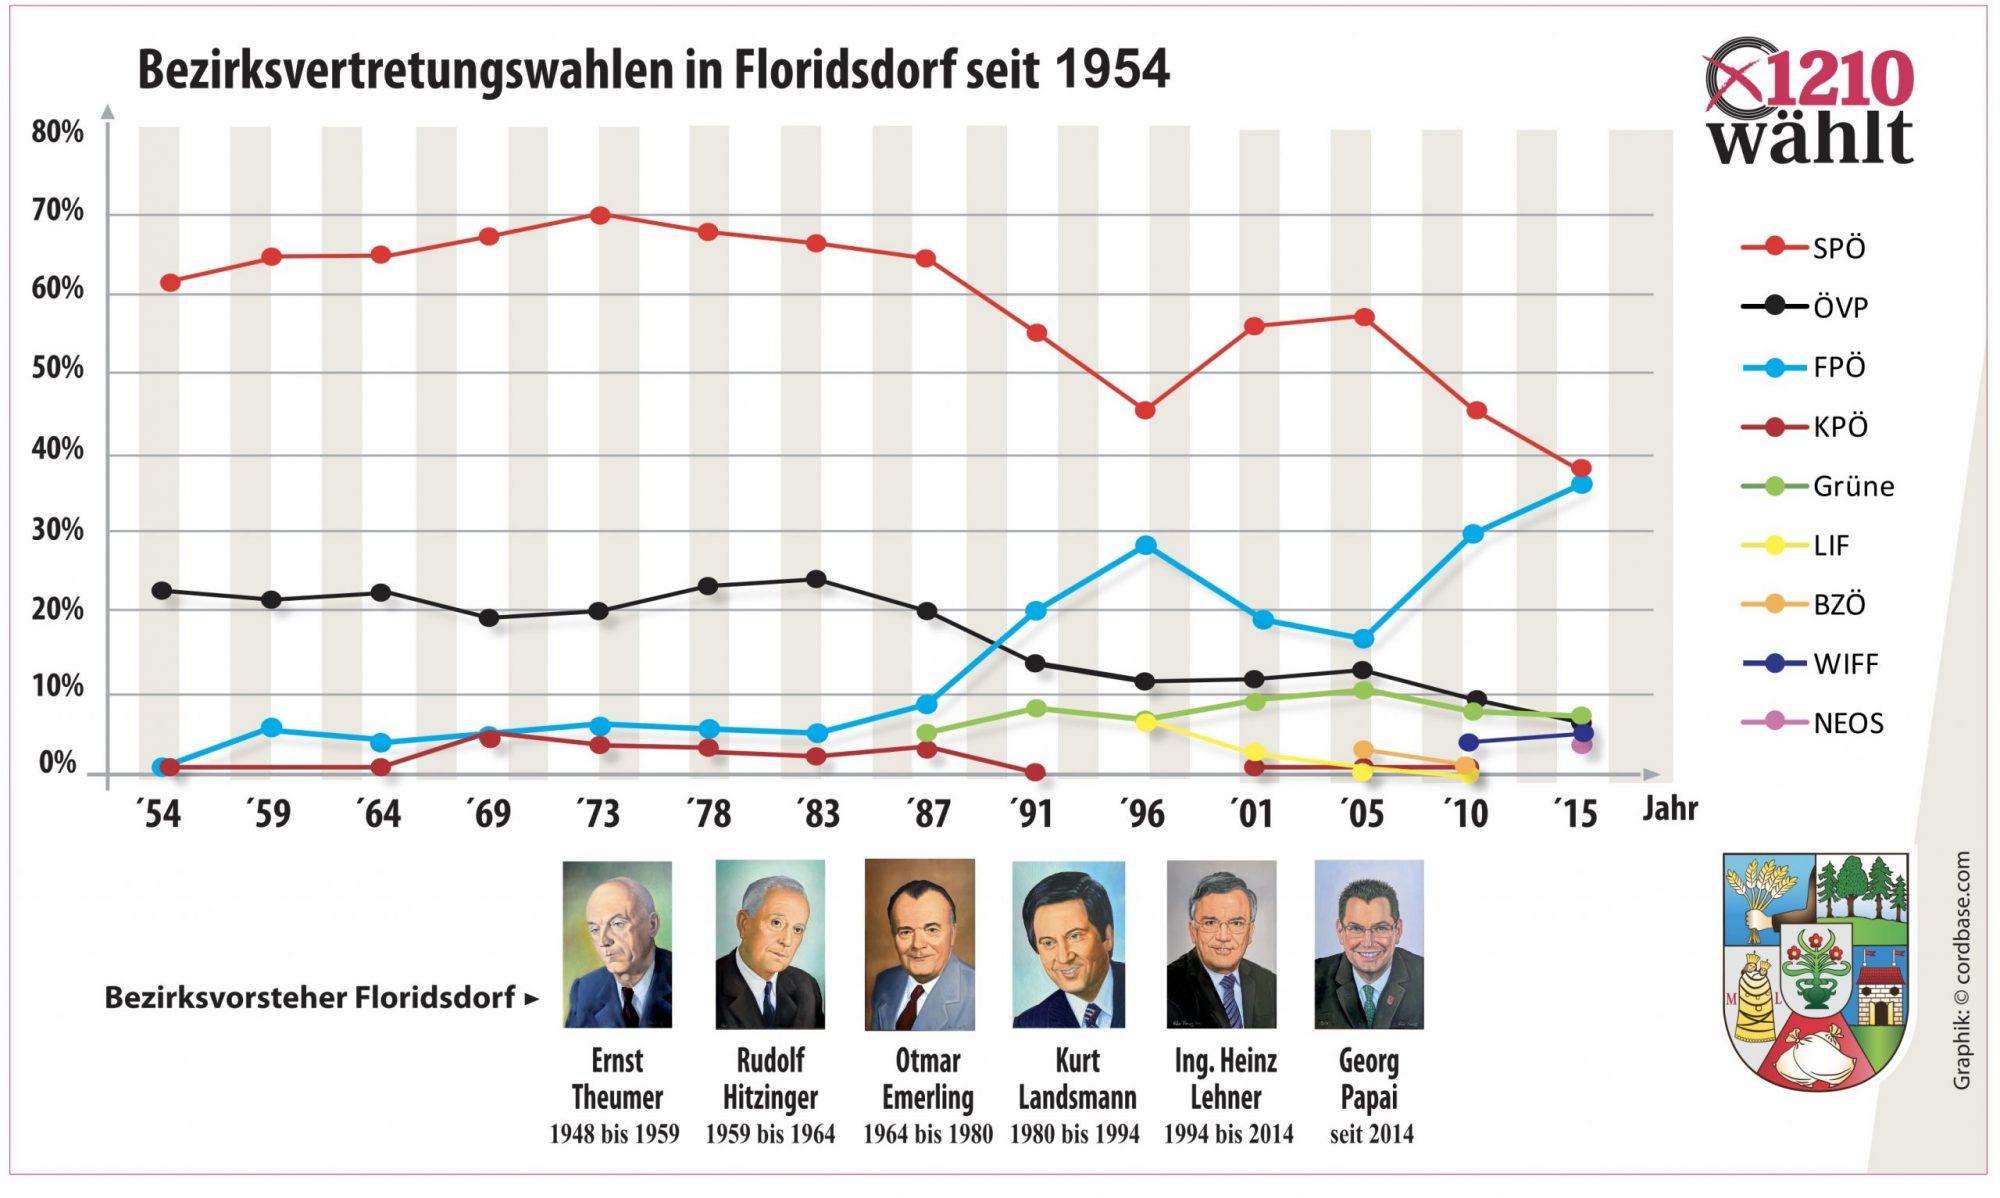 Bisherige Bezirksvertretungswahlen in Floridsdorf. Grafik: Robert Sturm - ciordbase.com